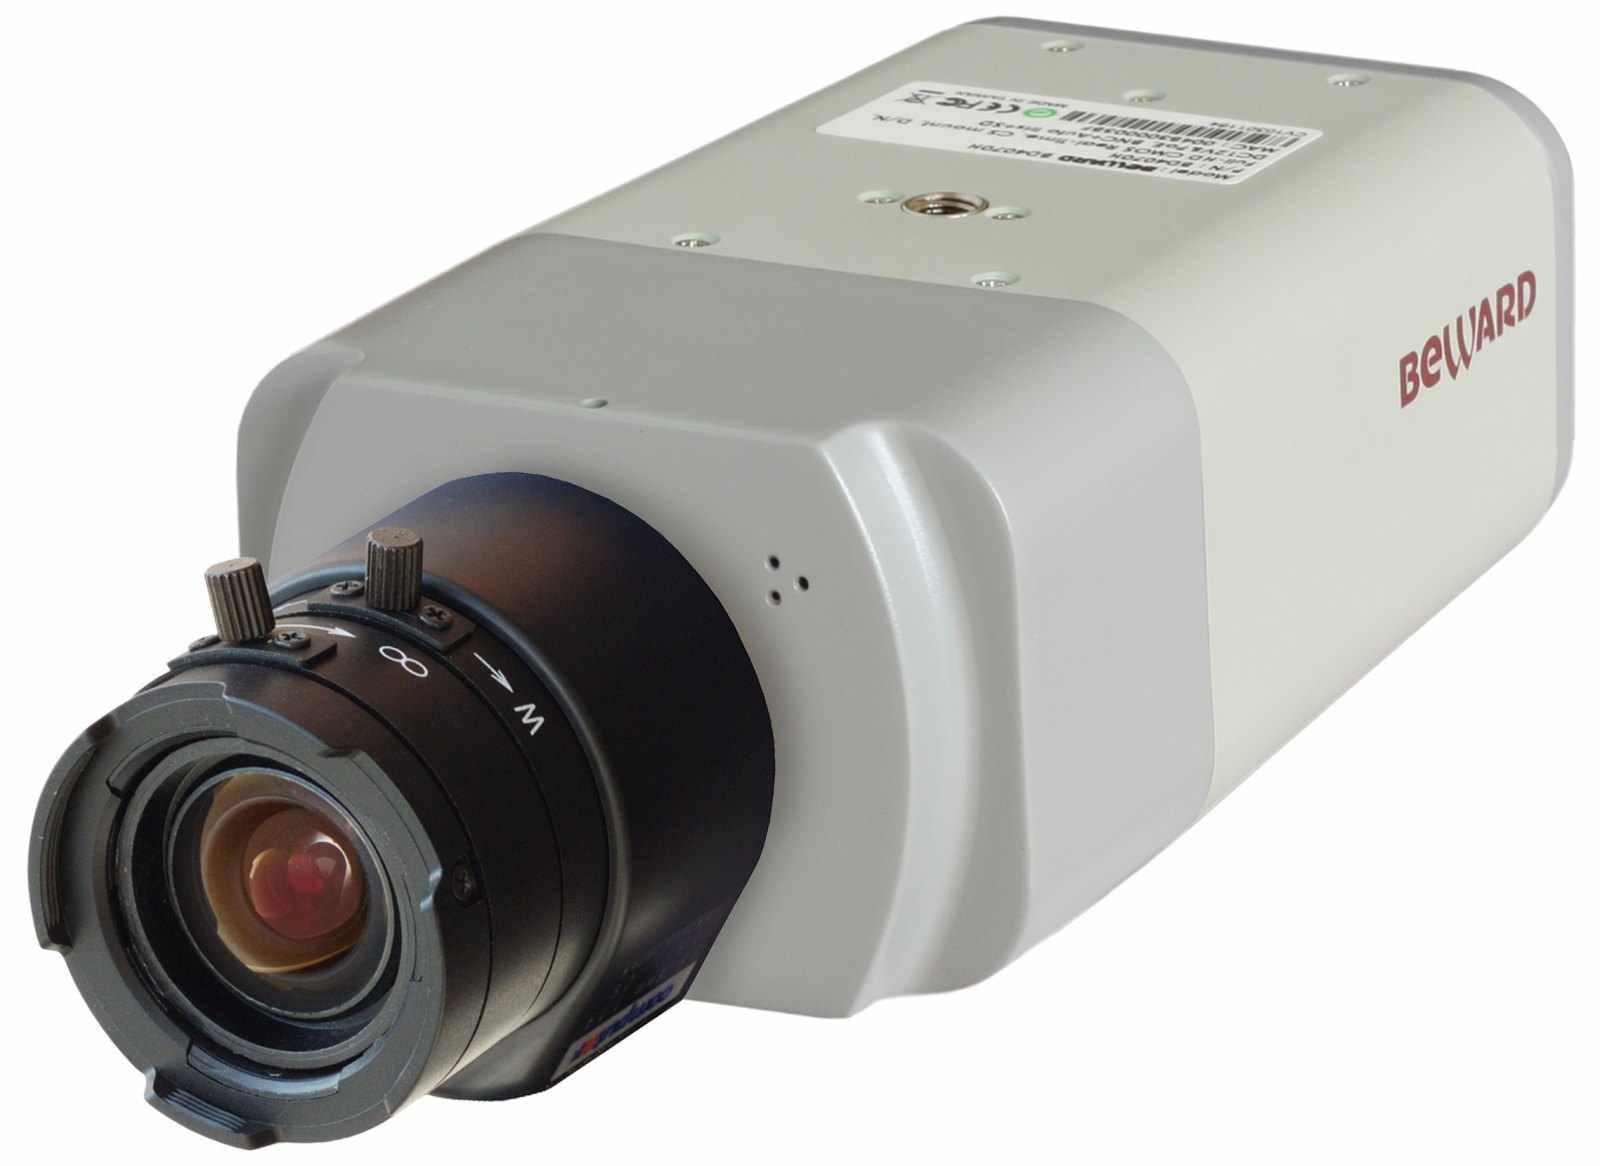 BD4070D, BD4070DH инструкция - камера видеонаблюдения